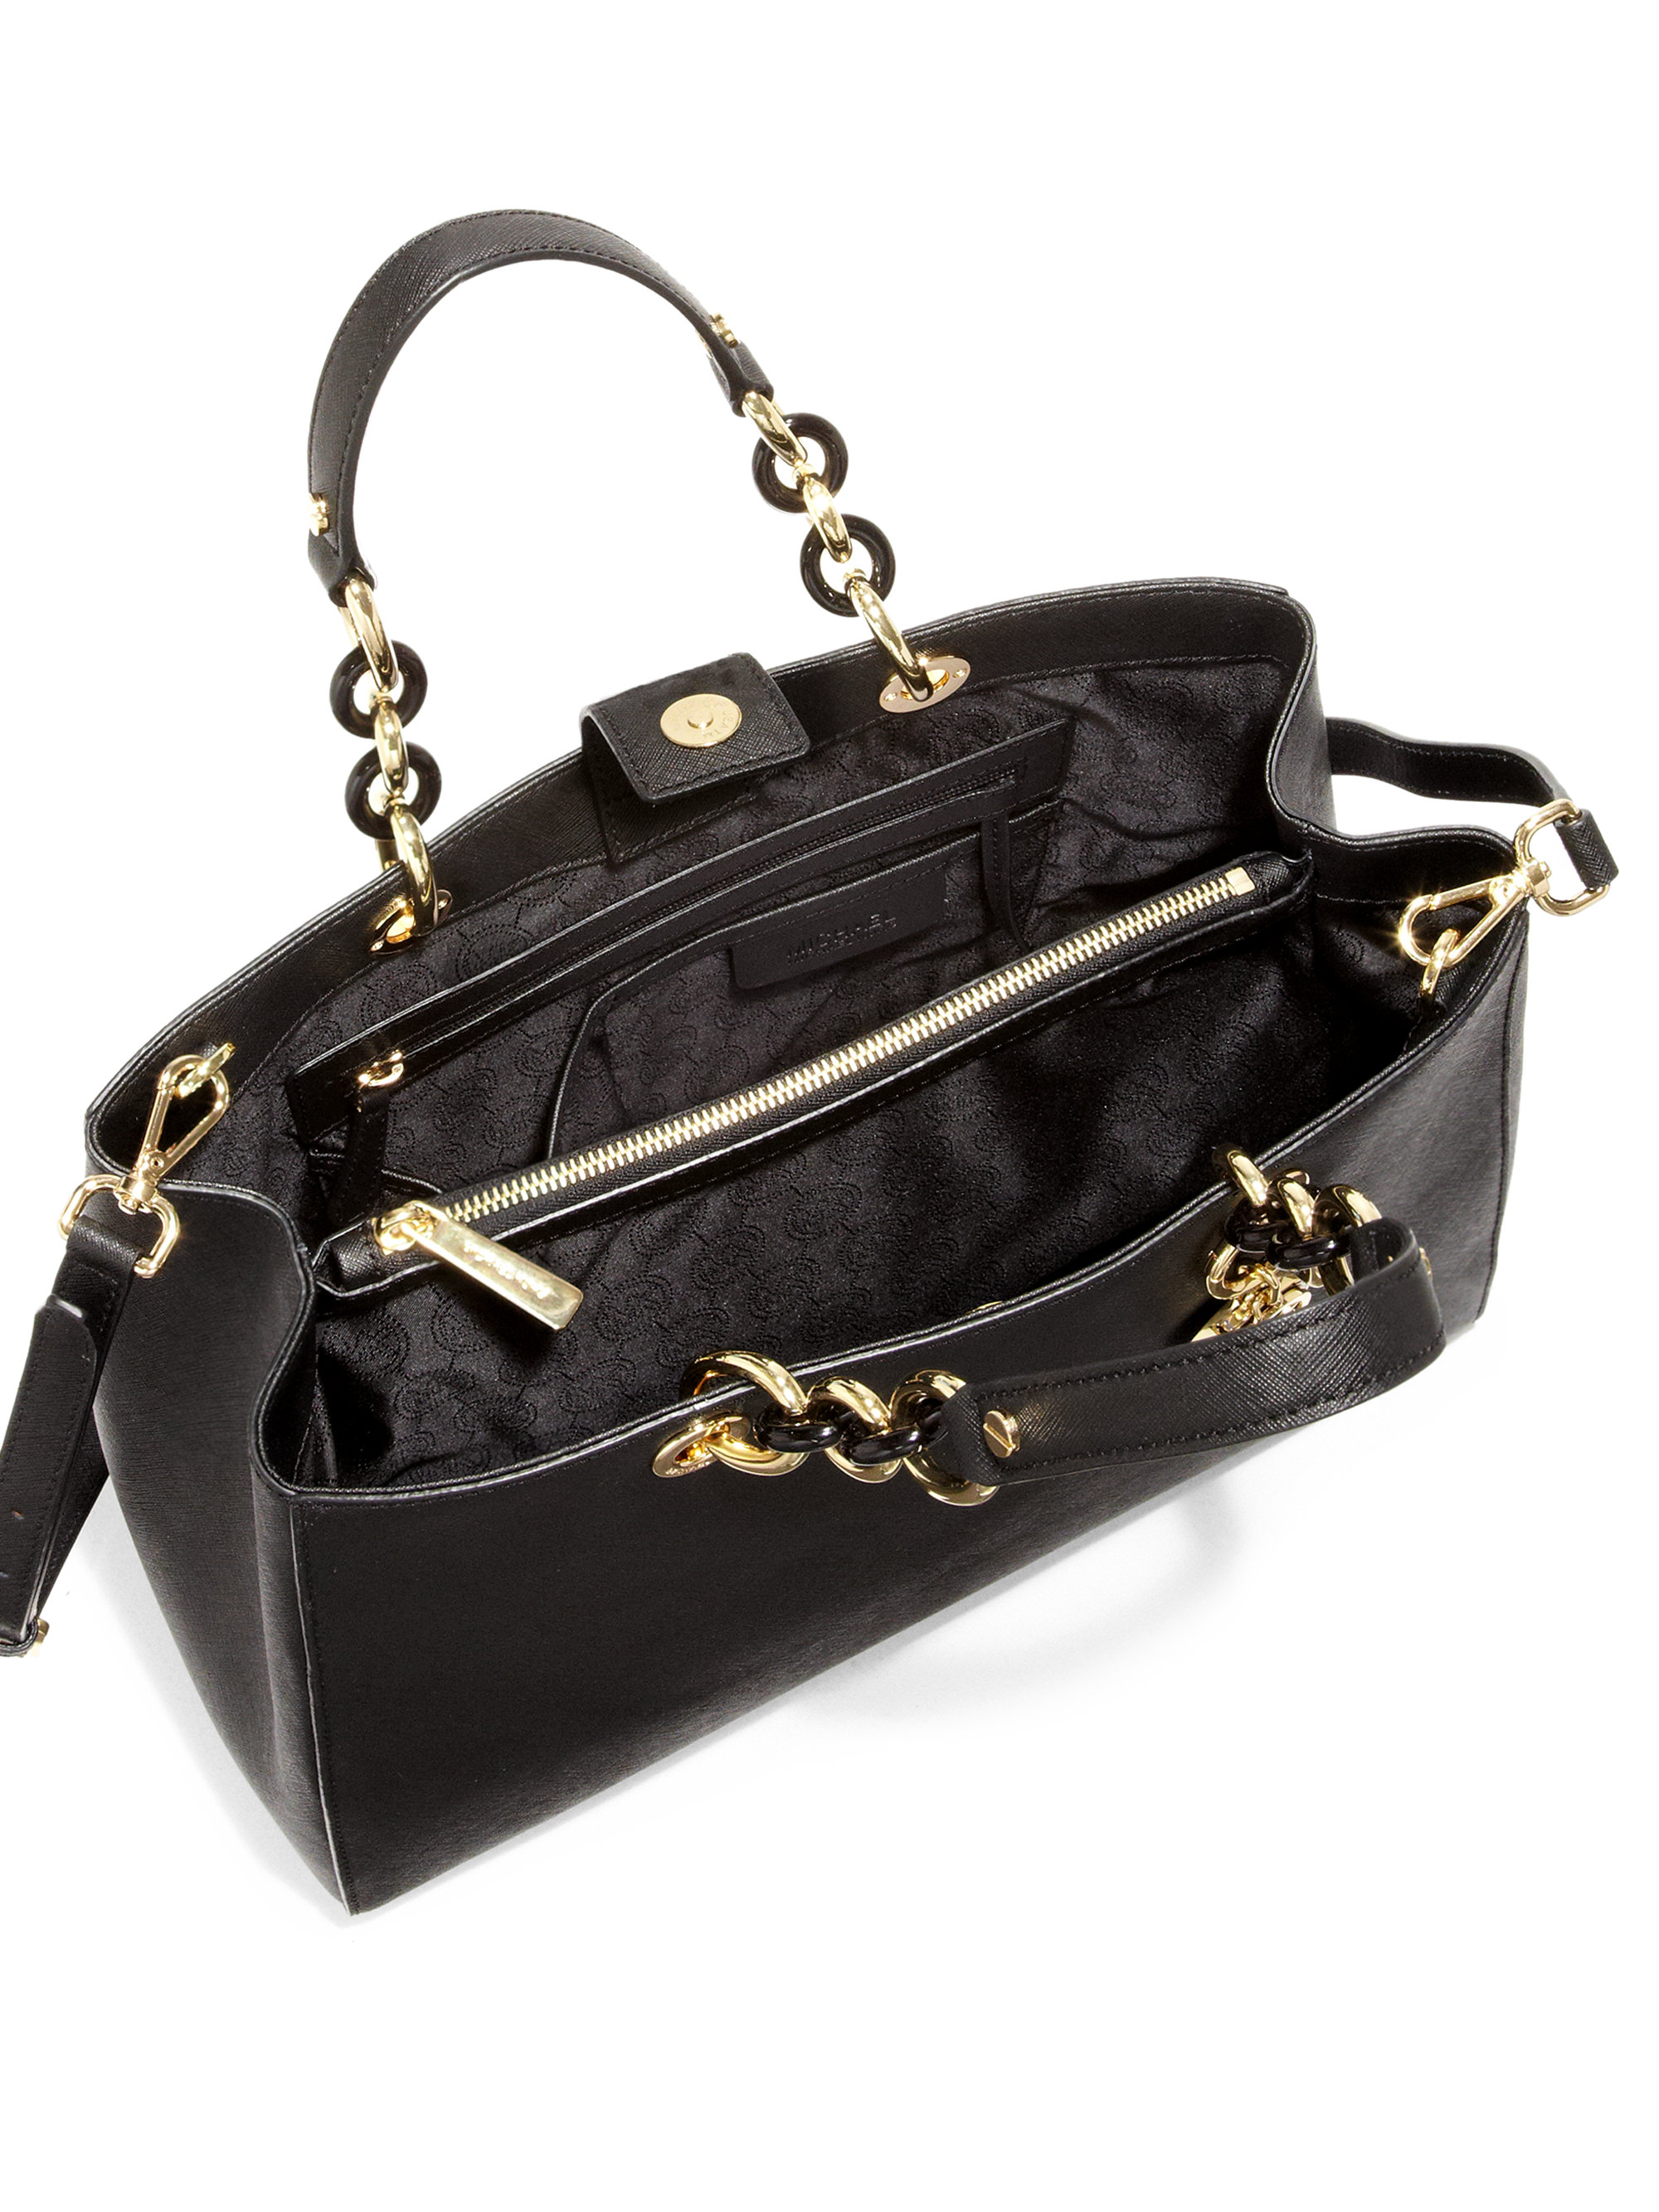 michael michael kors cynthia large satchel in black lyst. Black Bedroom Furniture Sets. Home Design Ideas